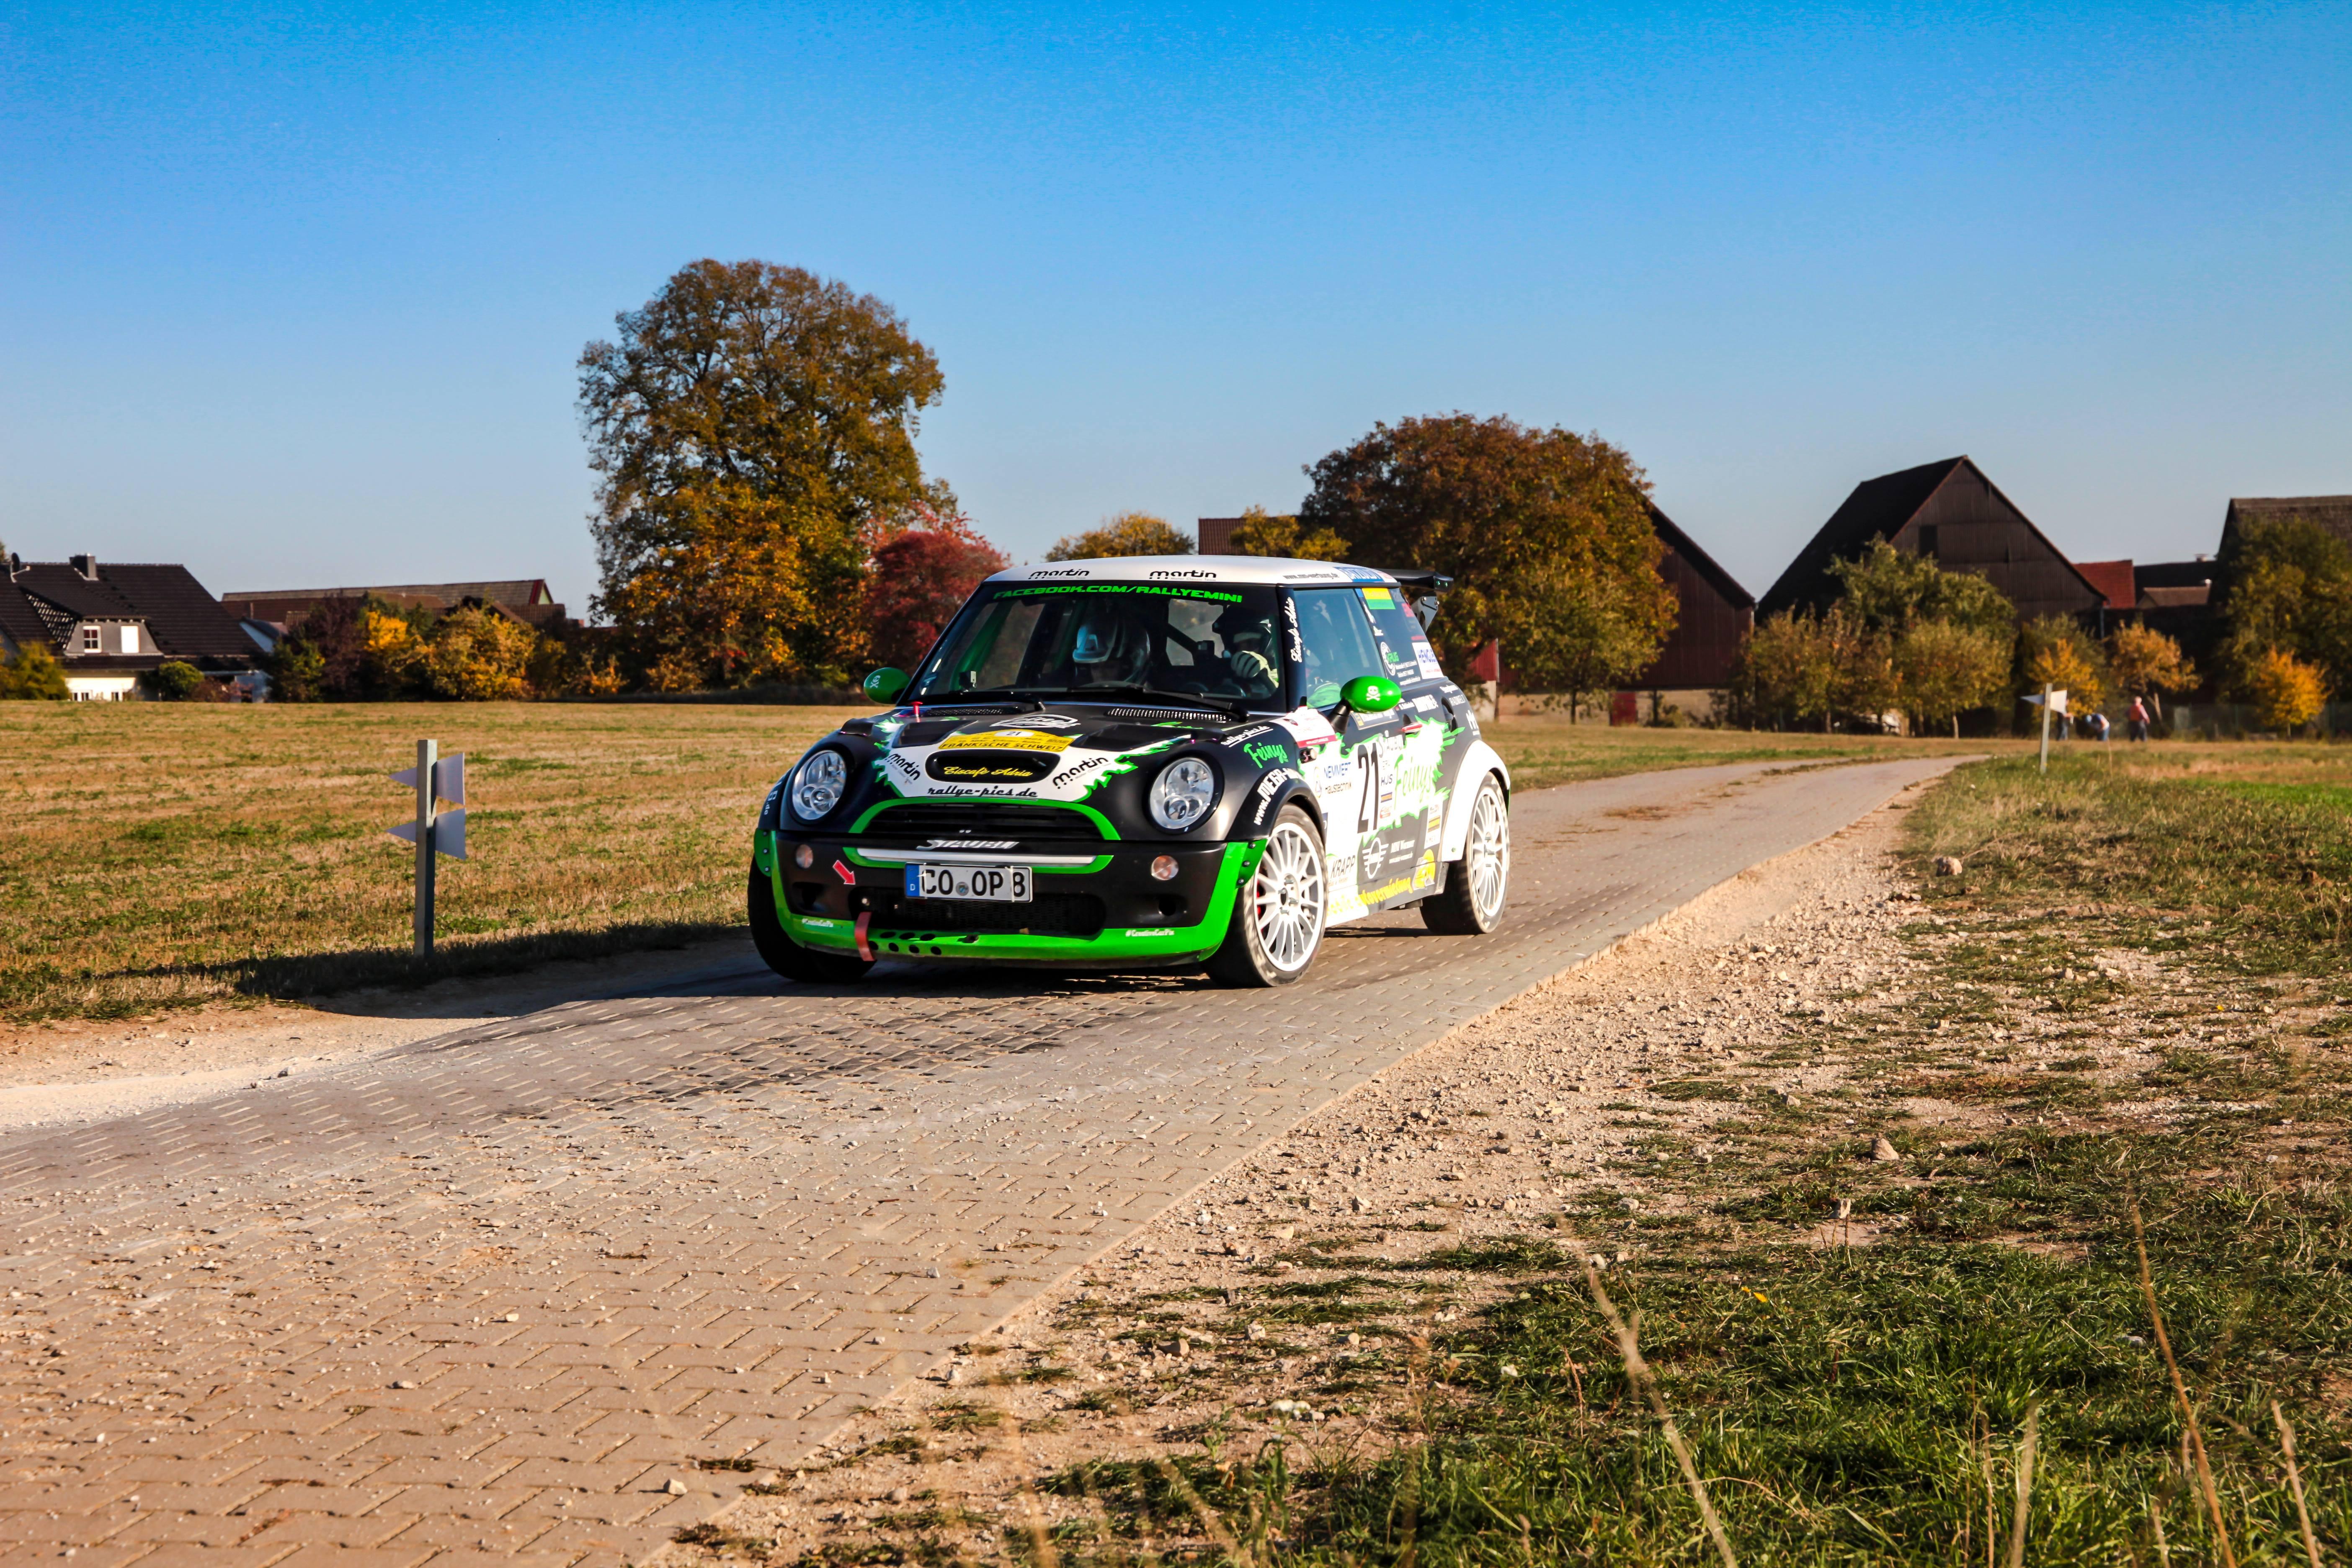 Rallye Cooper @ WP 4/8 Neudorf Rallye fränkische Schweiz 2018